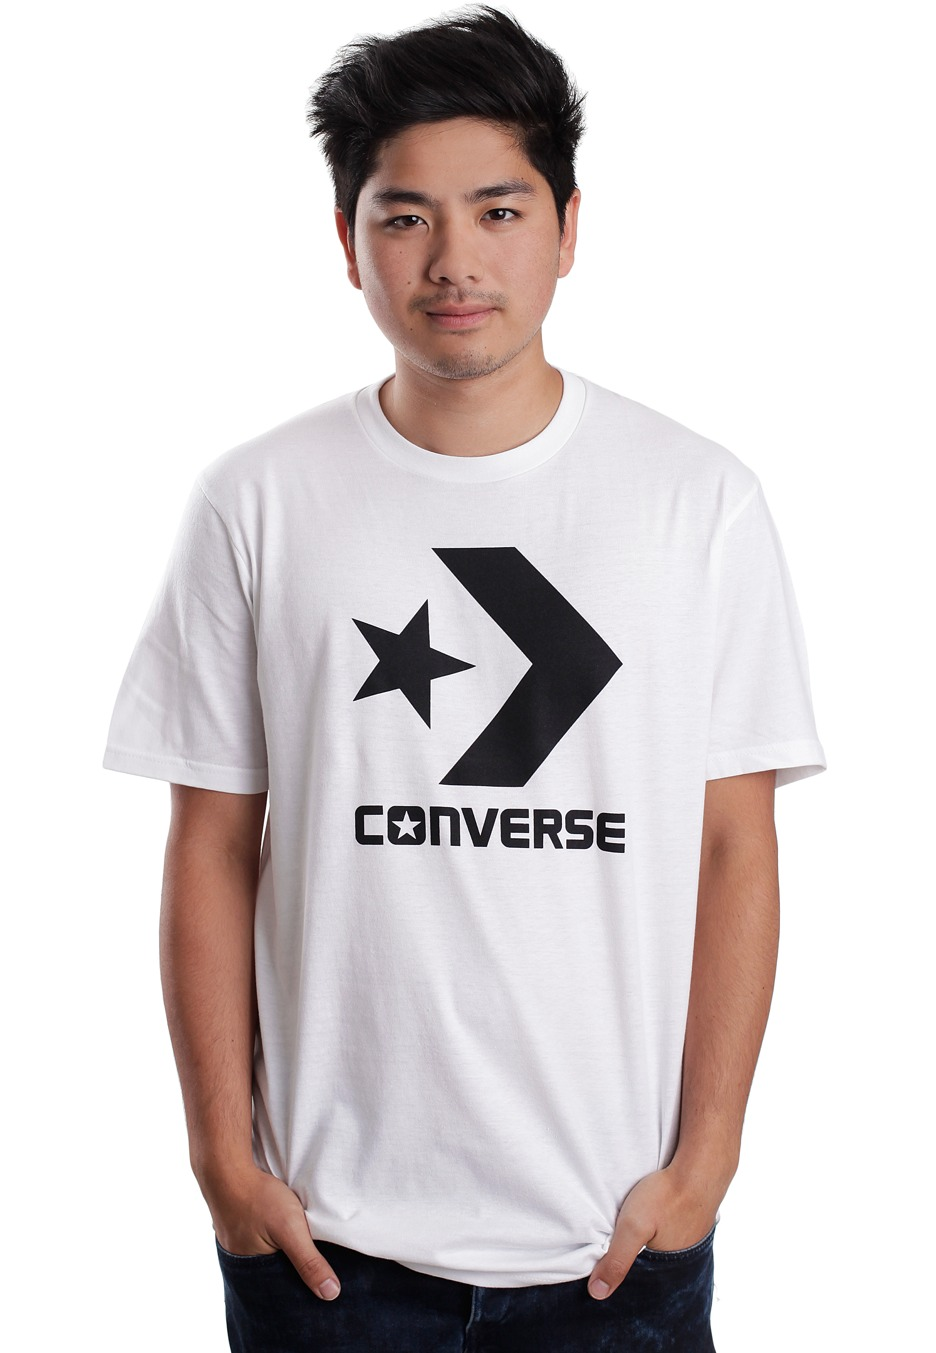 8936dc384390 Converse - Cons Str Chevron Optic White - T-Shirt - Impericon.com UK